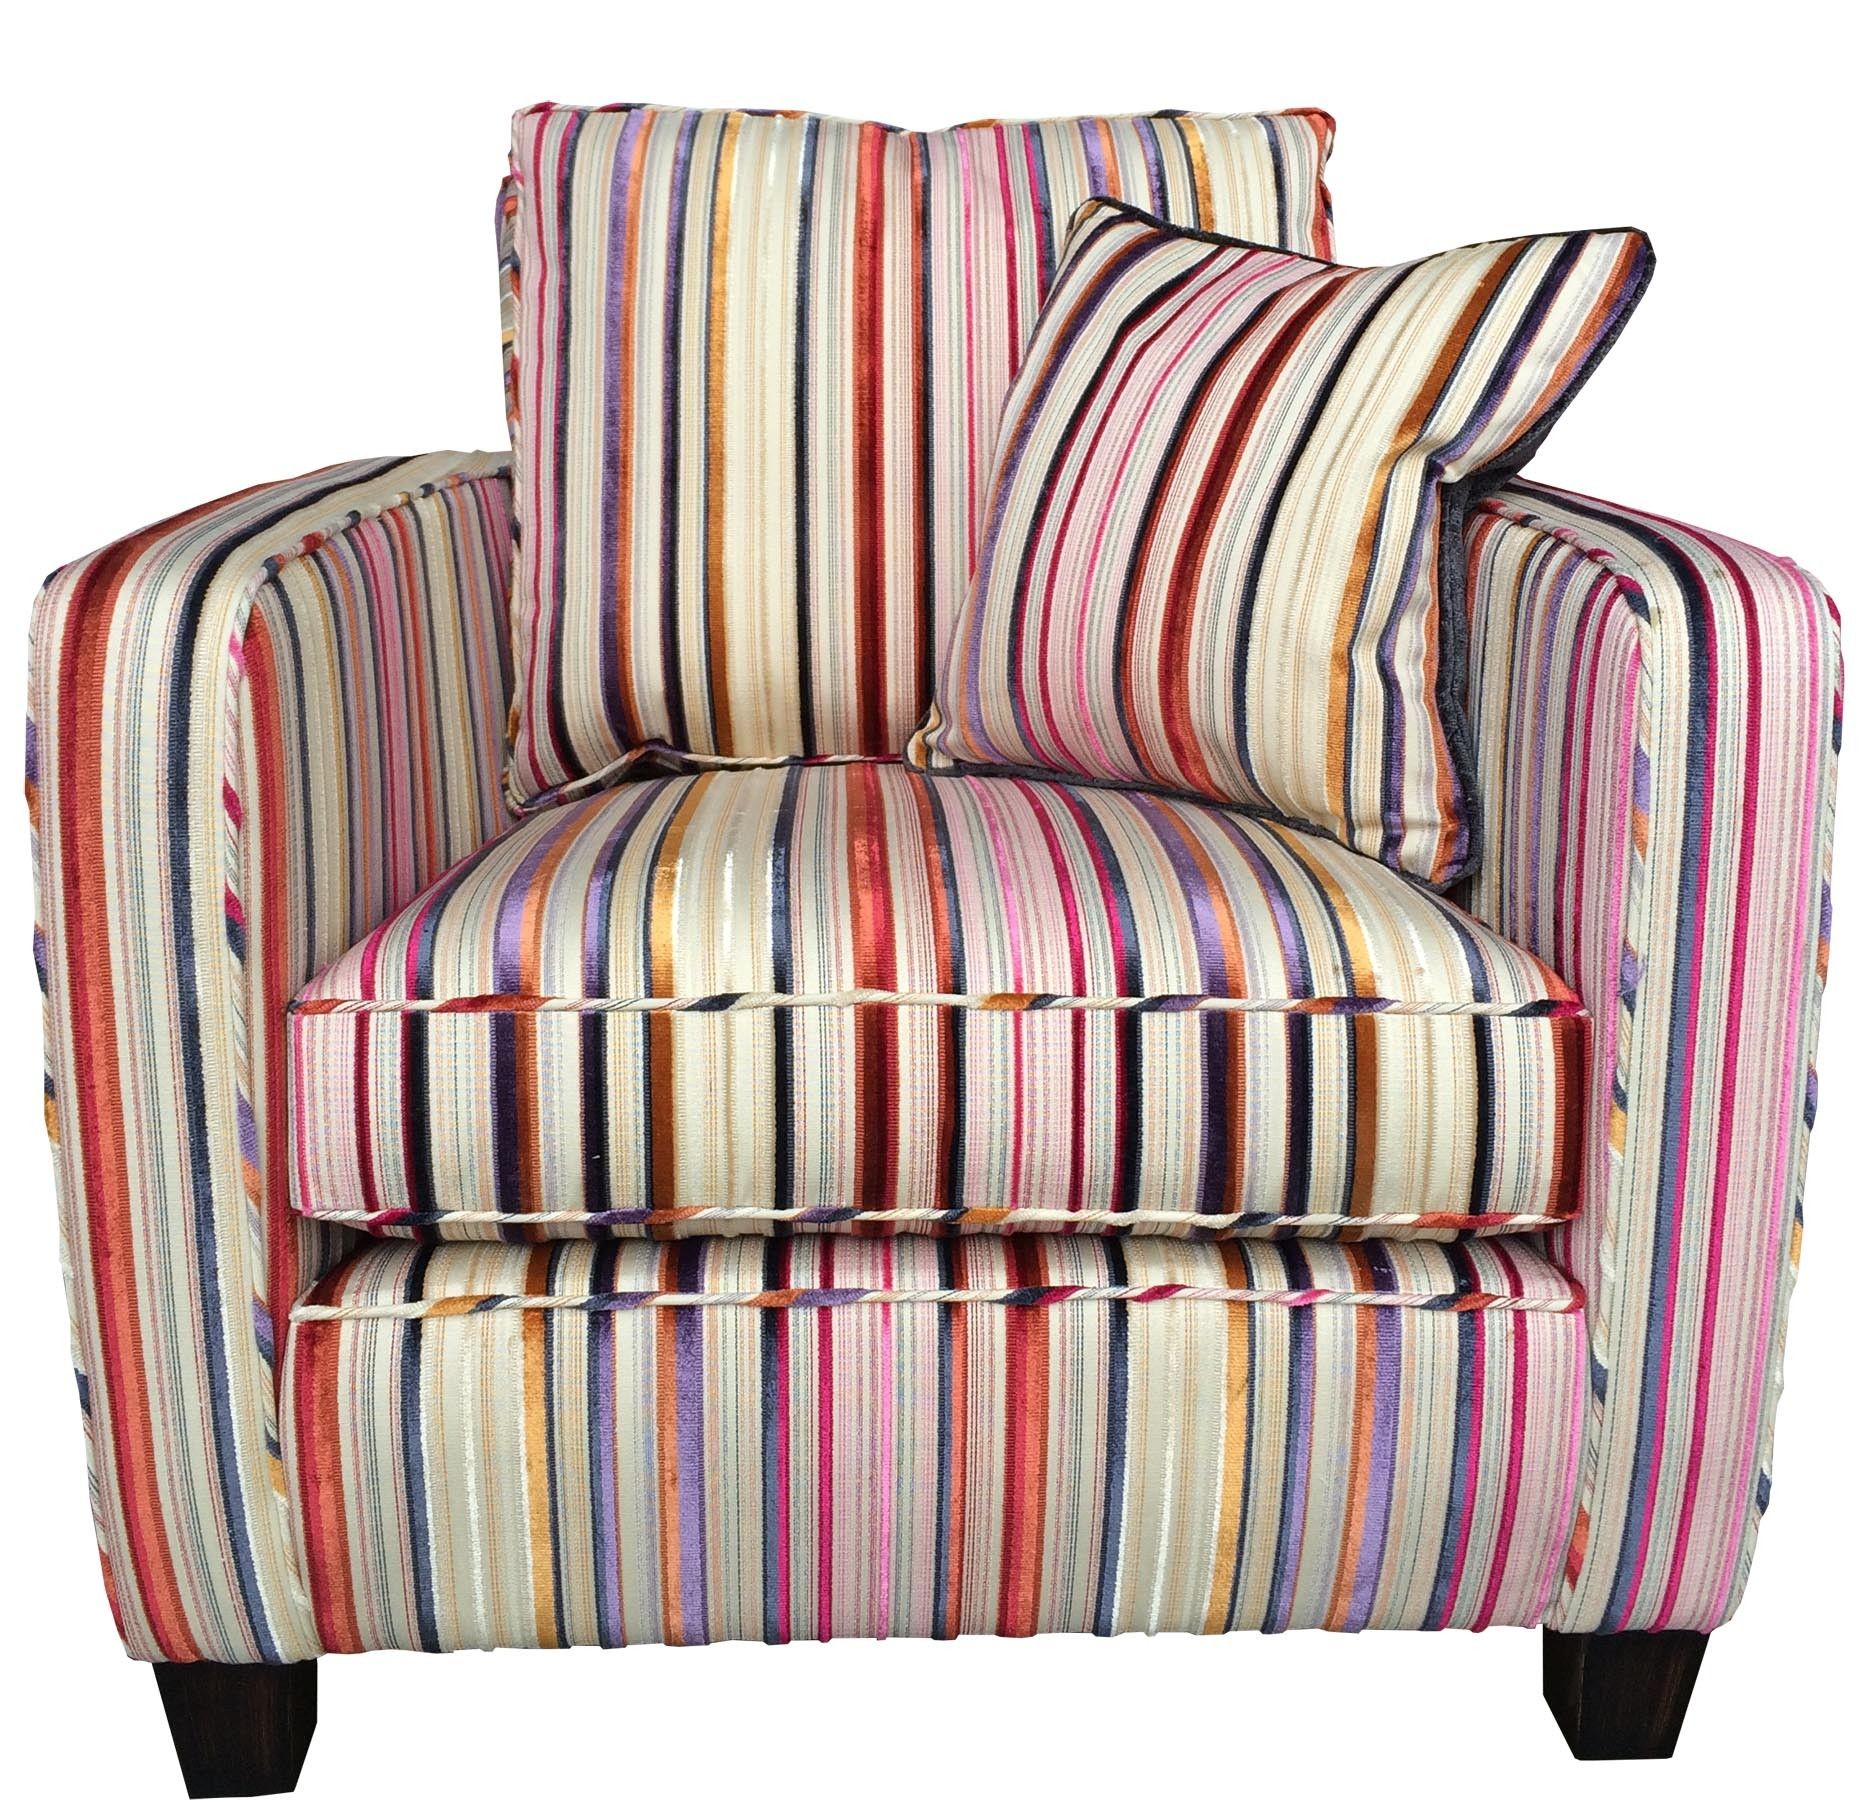 Clearance Duresta Viola Chair Bancroft Stripe Faberge